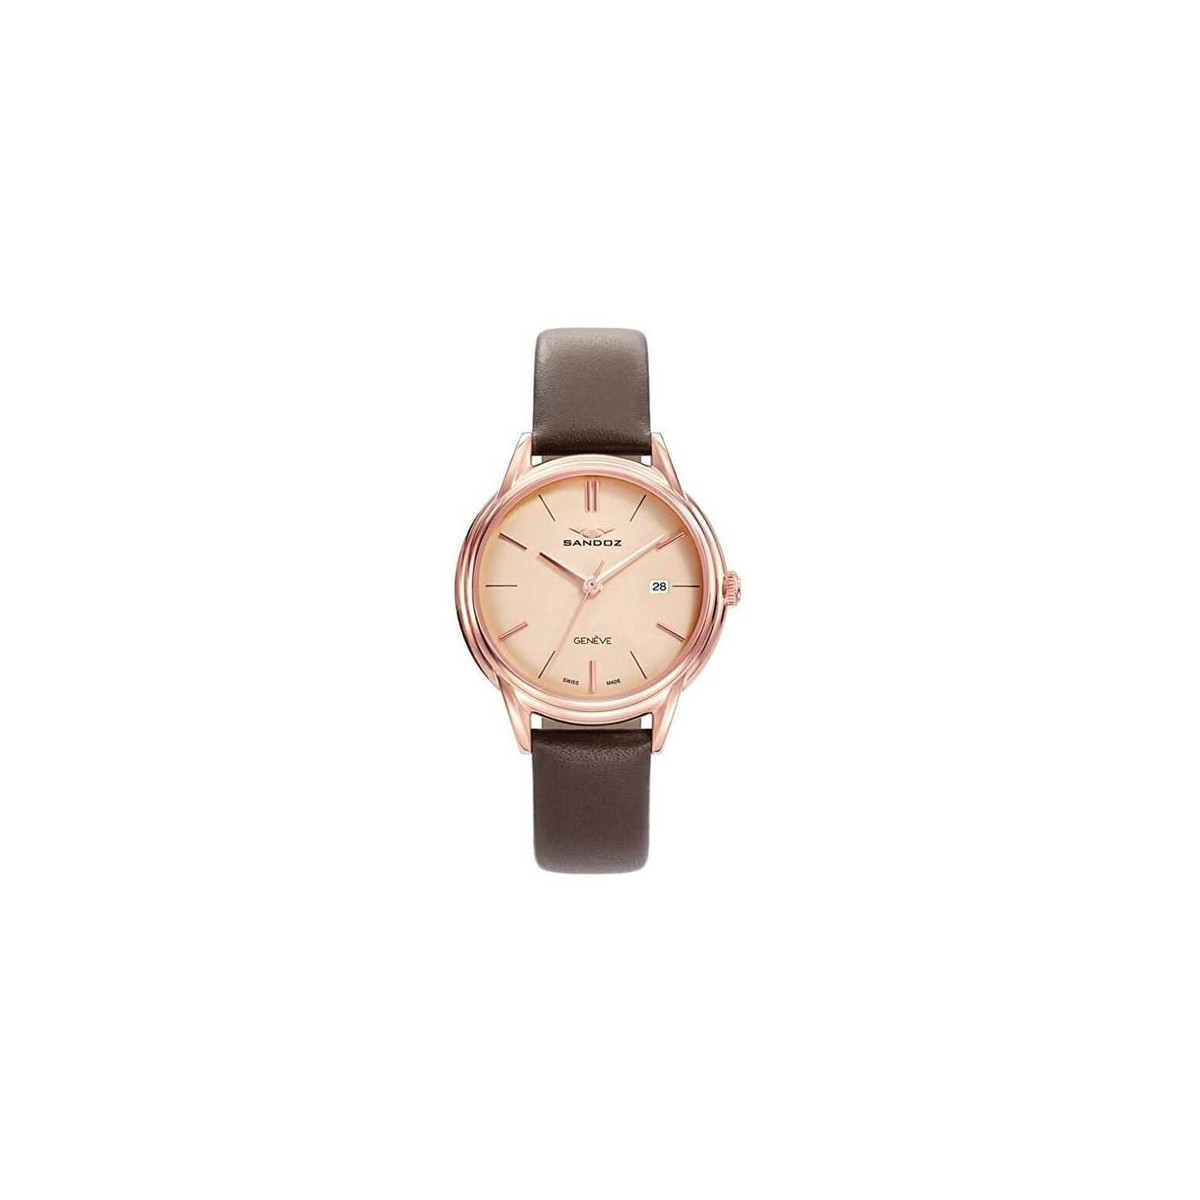 Reloj Sandoz Heritage Mujer Piel 81354-97